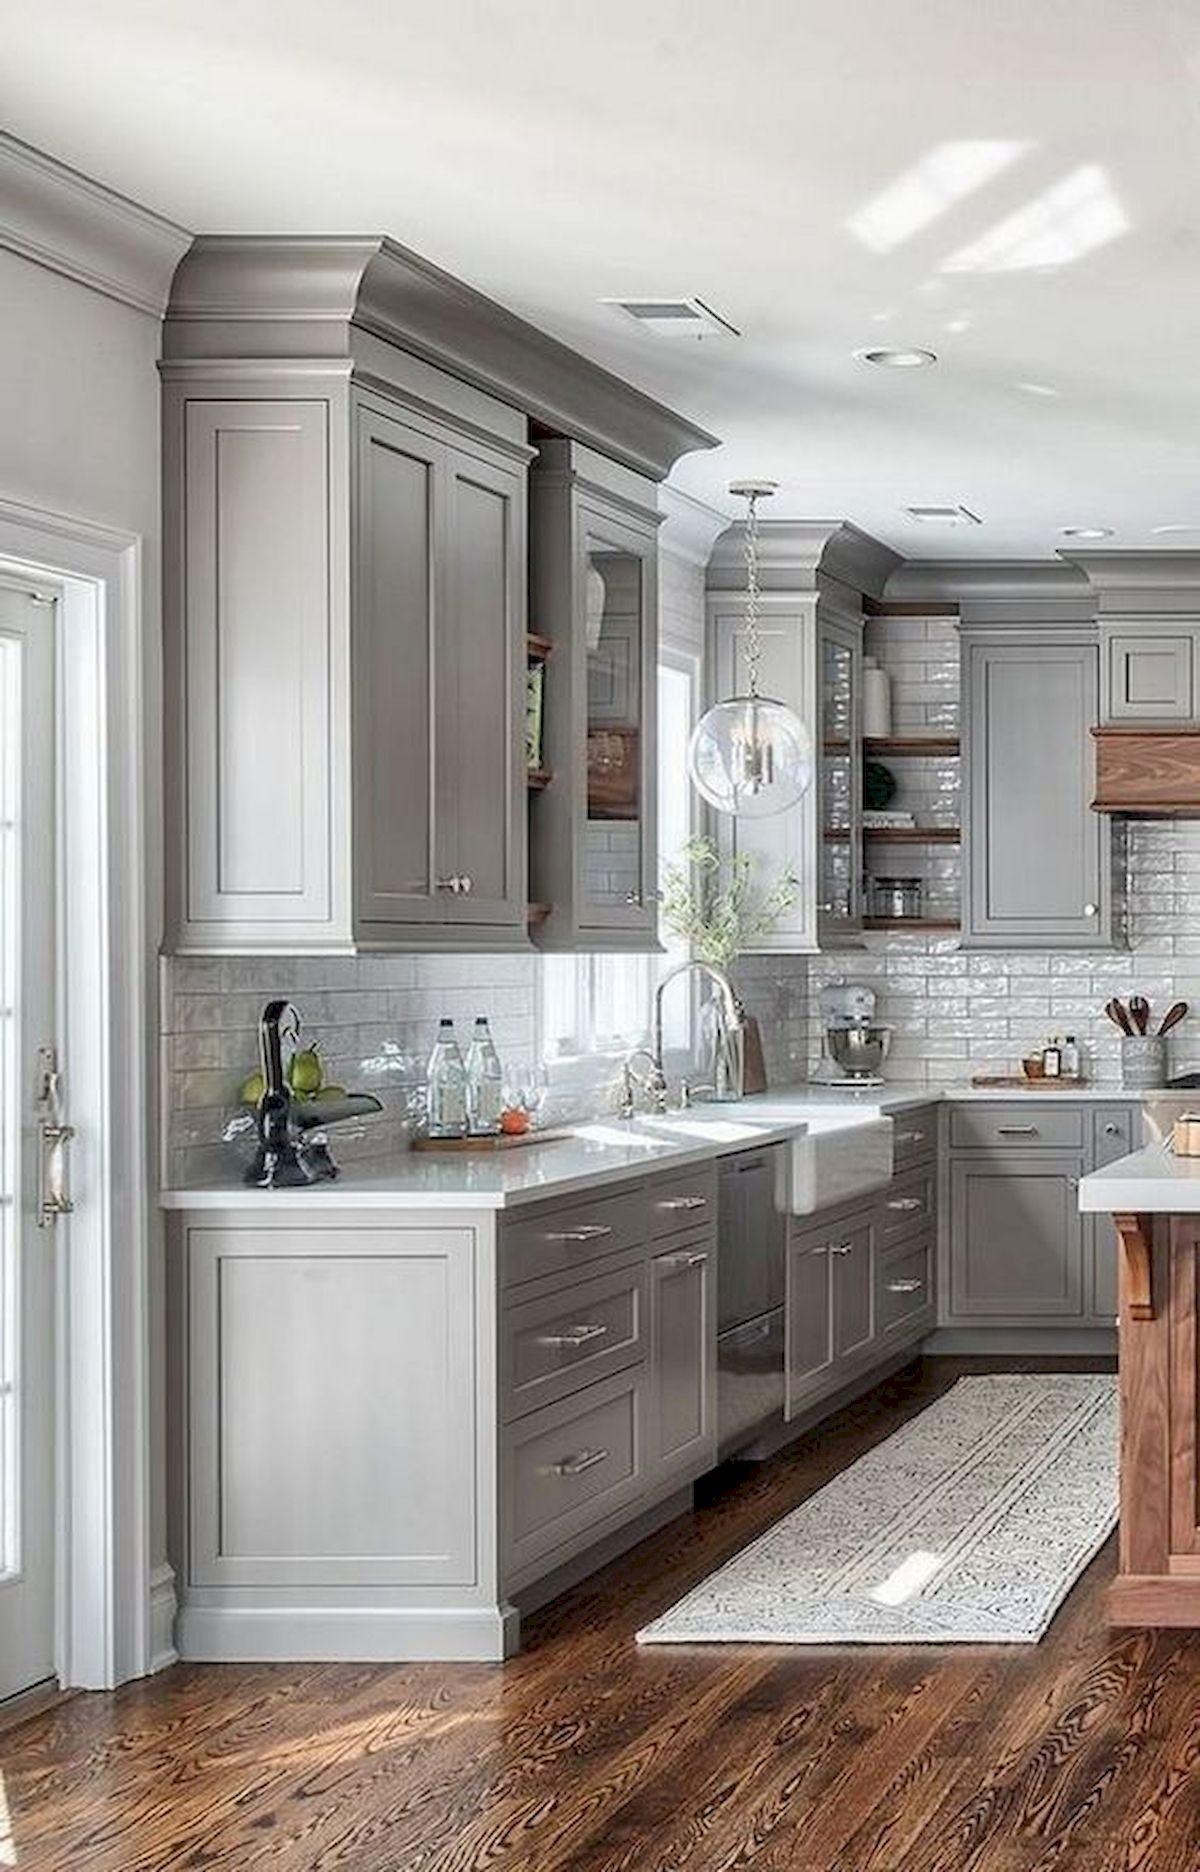 45 Easy Kitchen Decor and Design Ideas (30)